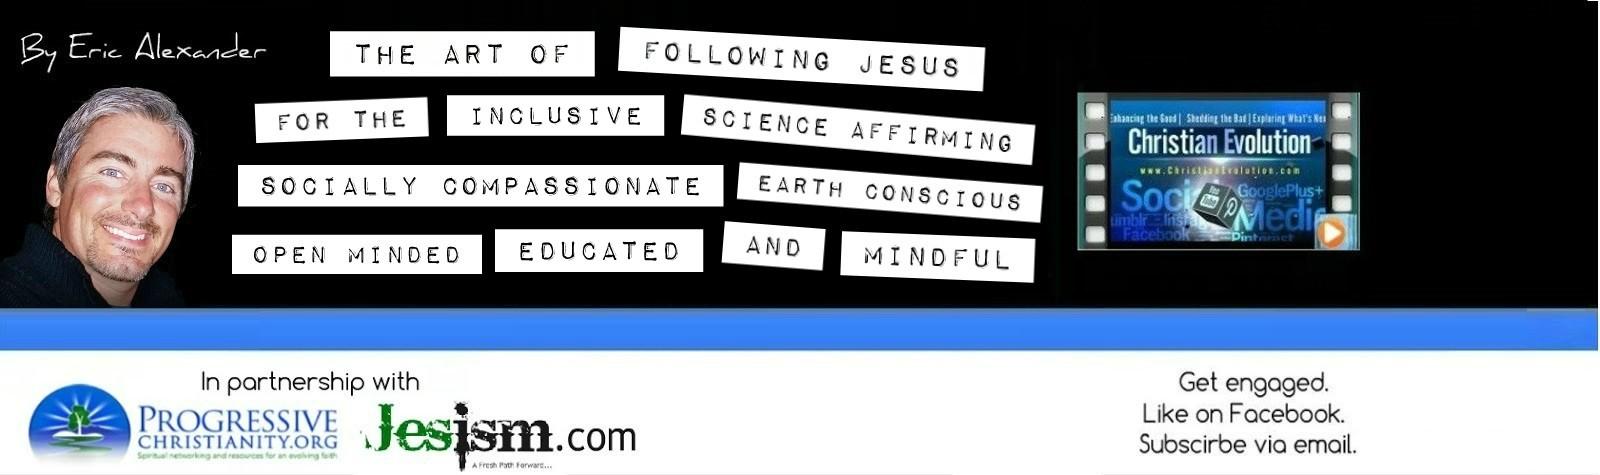 Christian Evolution | Progressing Christianity